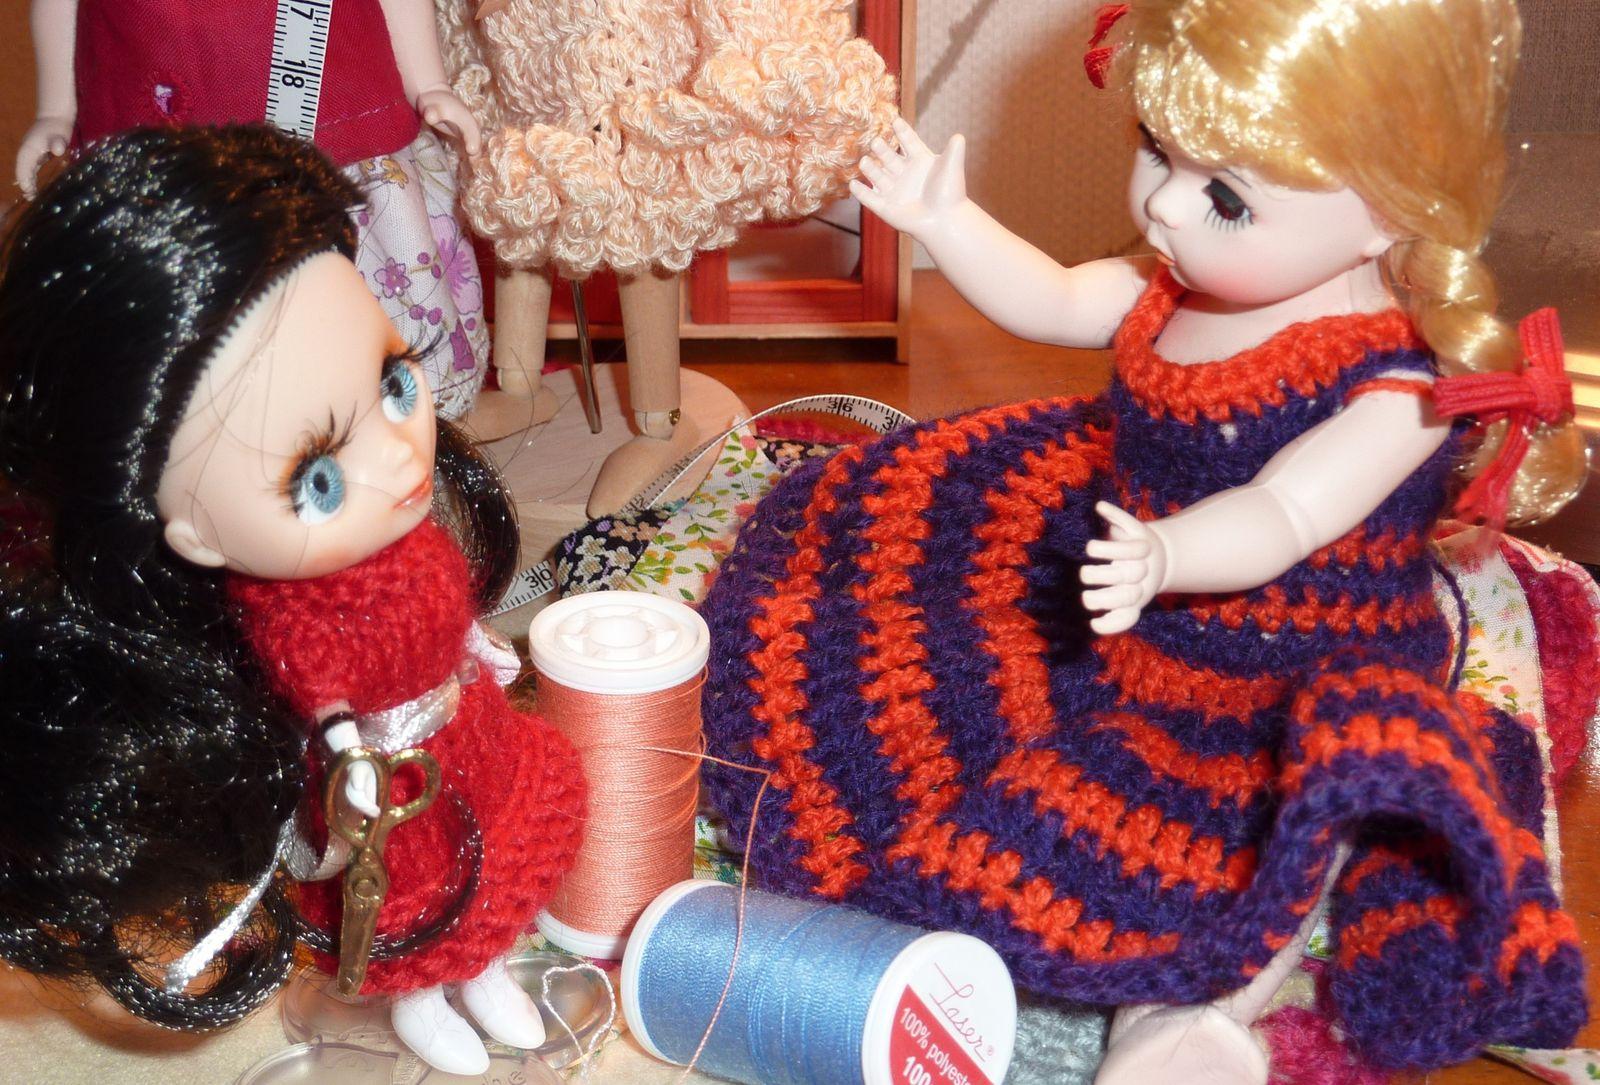 Quand je serai grande, je serai crocheteuse &amp&#x3B; coutureuse